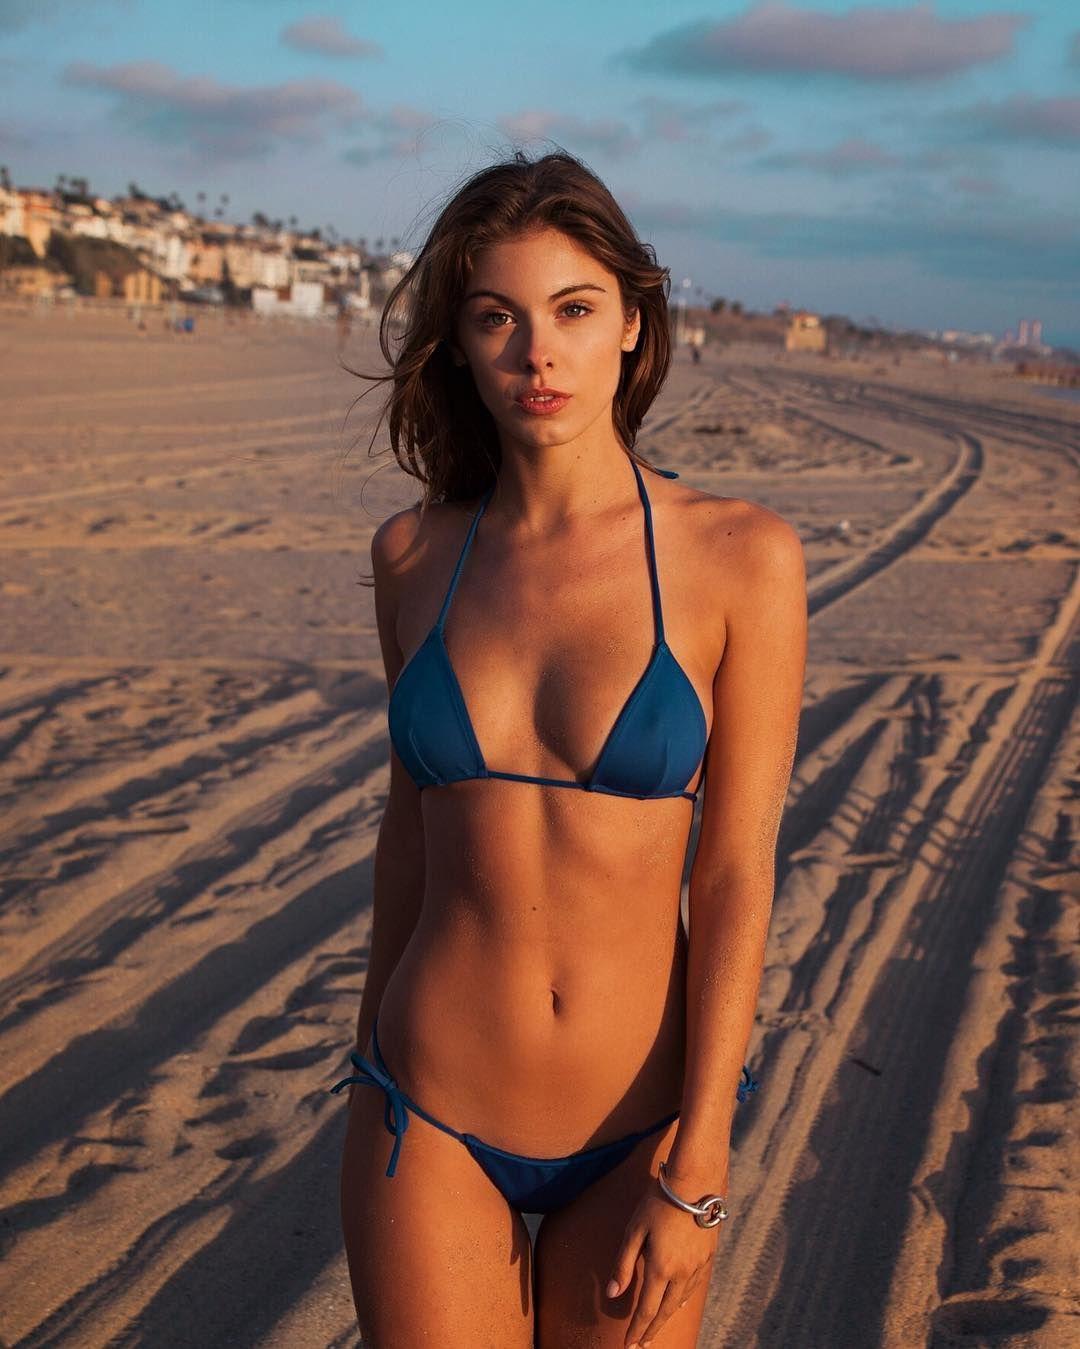 Charming bikini girls daily pics sunny beaches u stylish swimwear